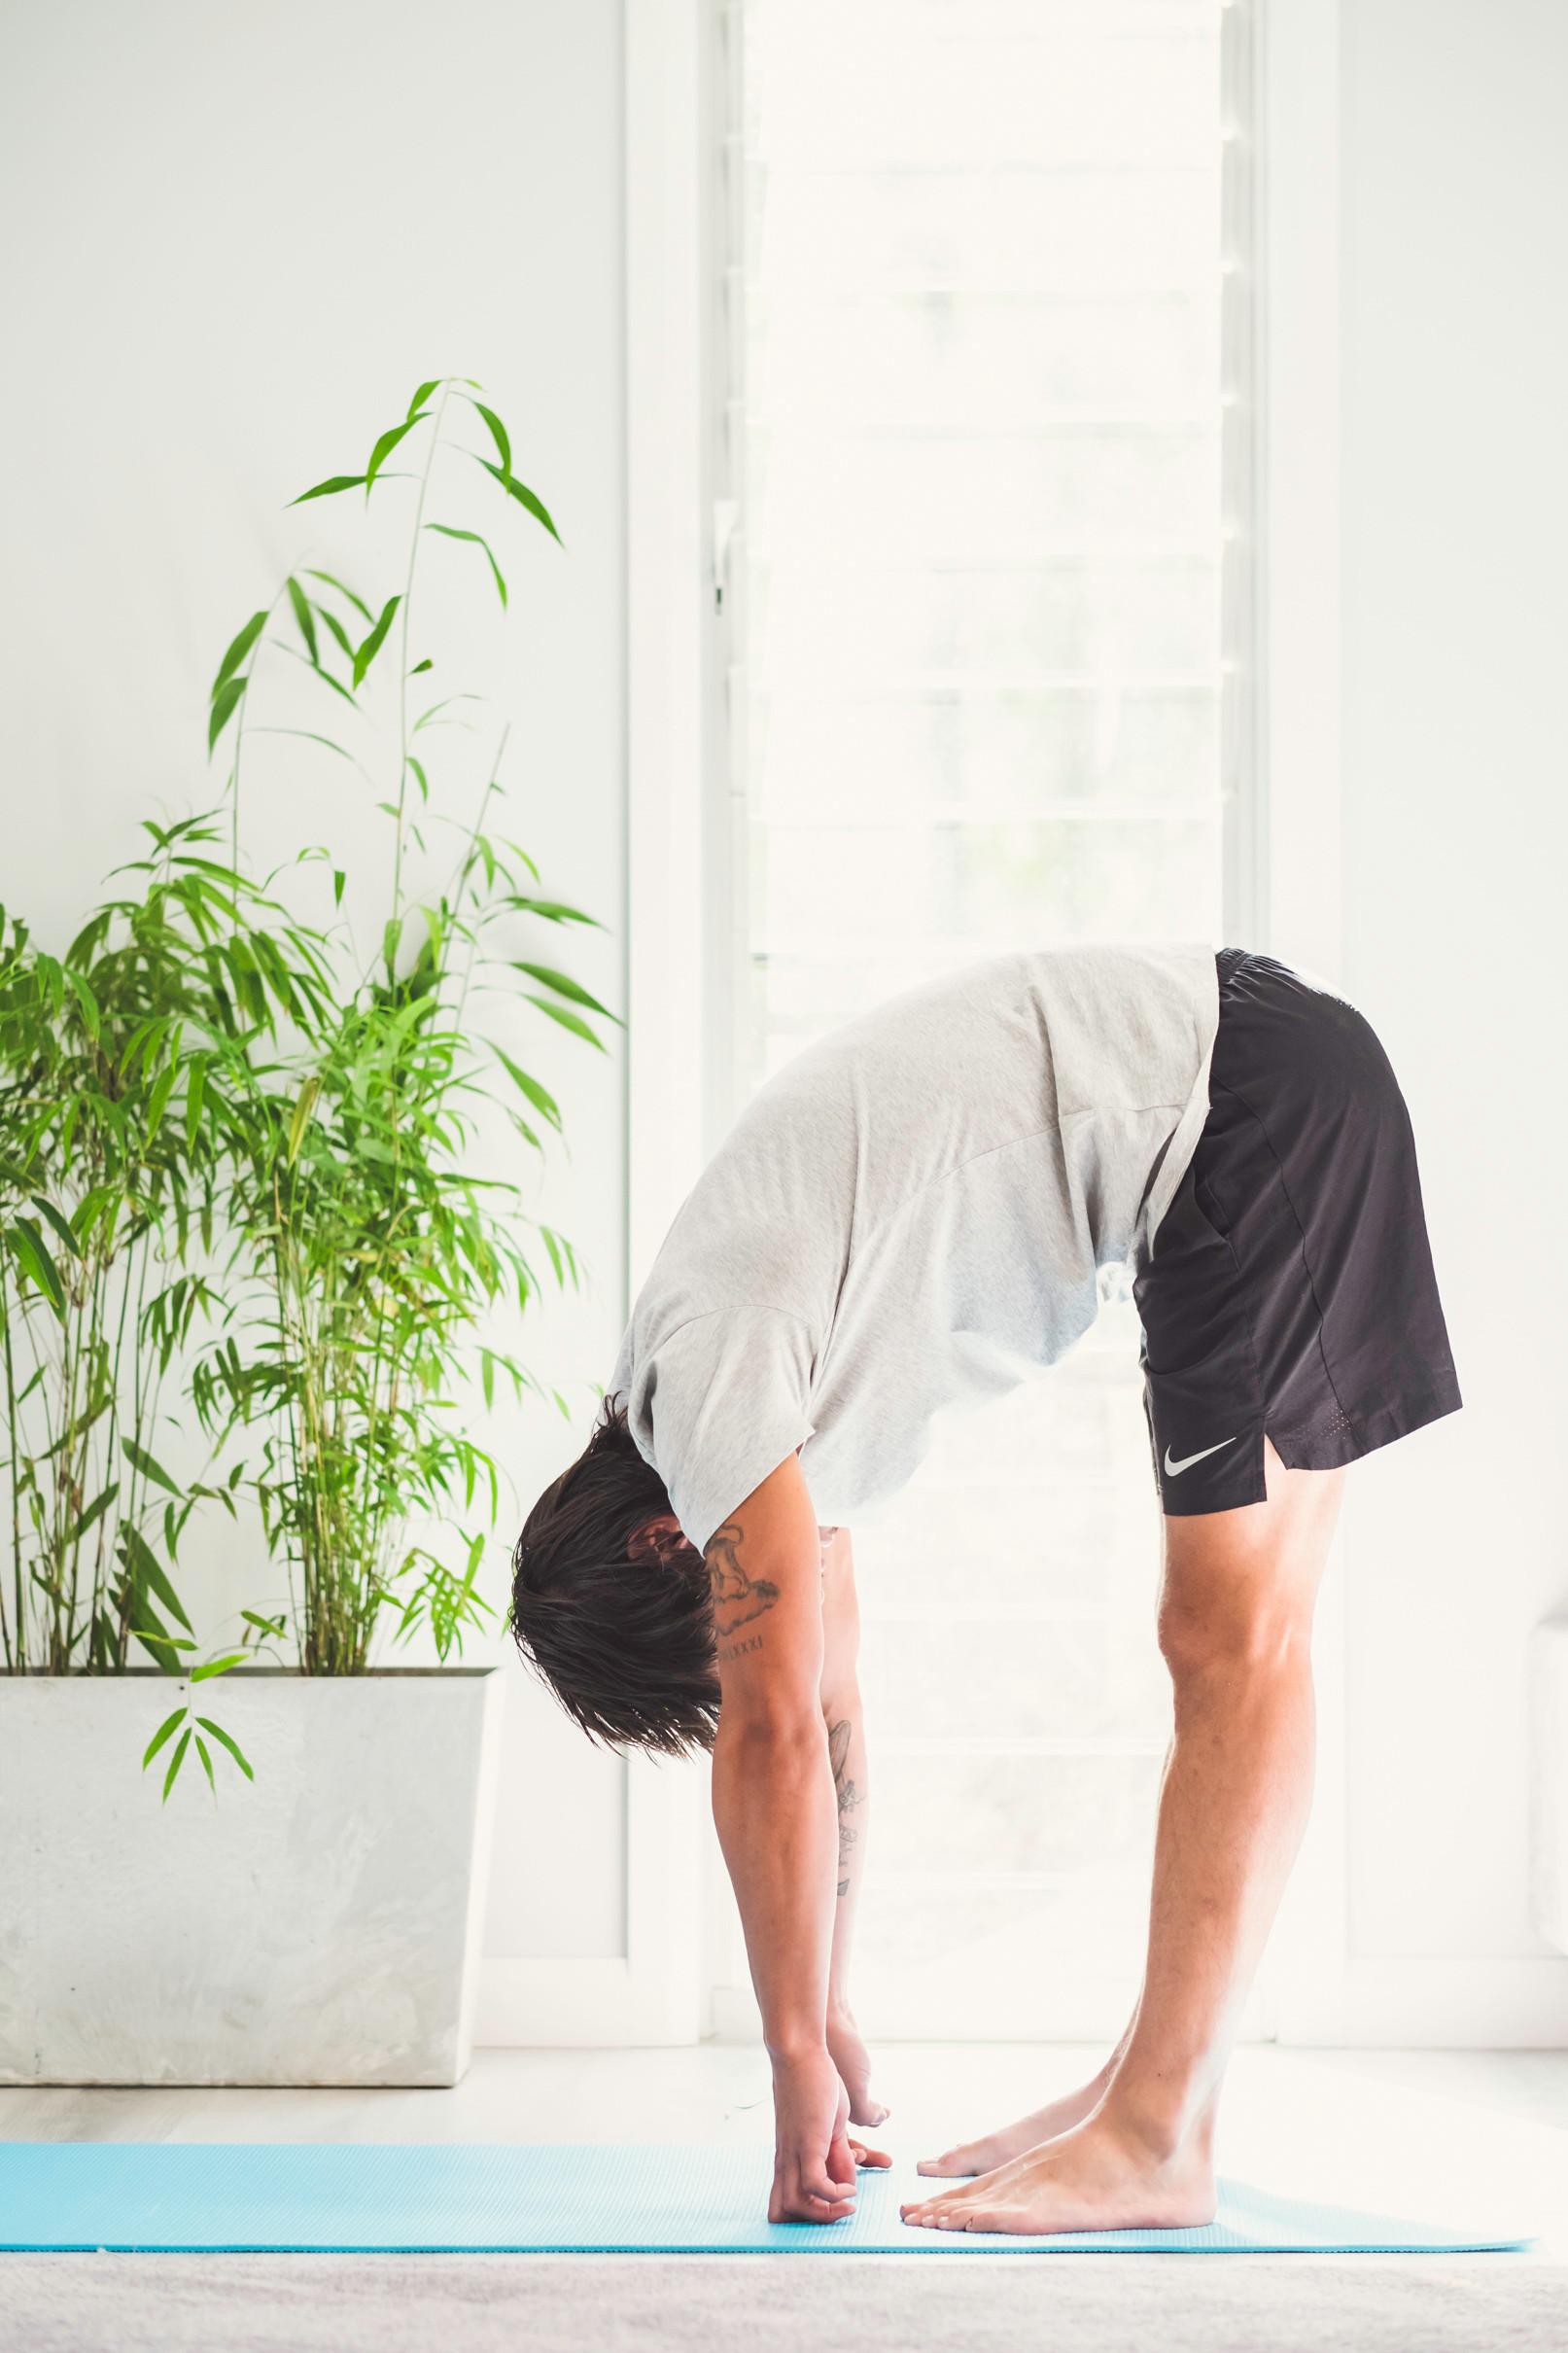 10 week - Gentle Yoga Classes - Thursday